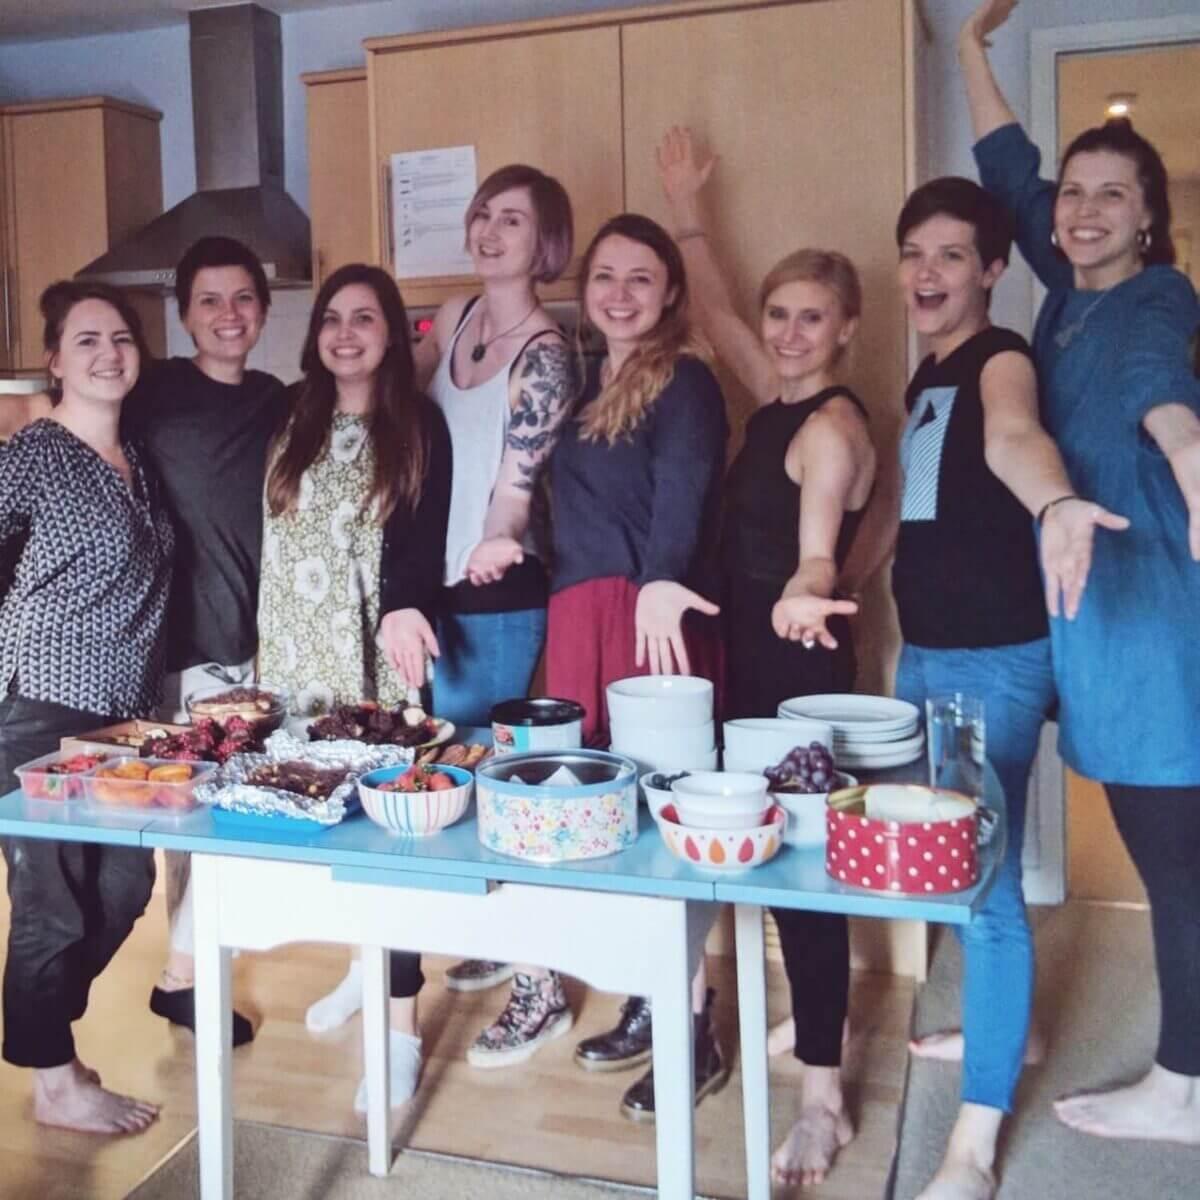 Bristol Girl Bosses Group Photo